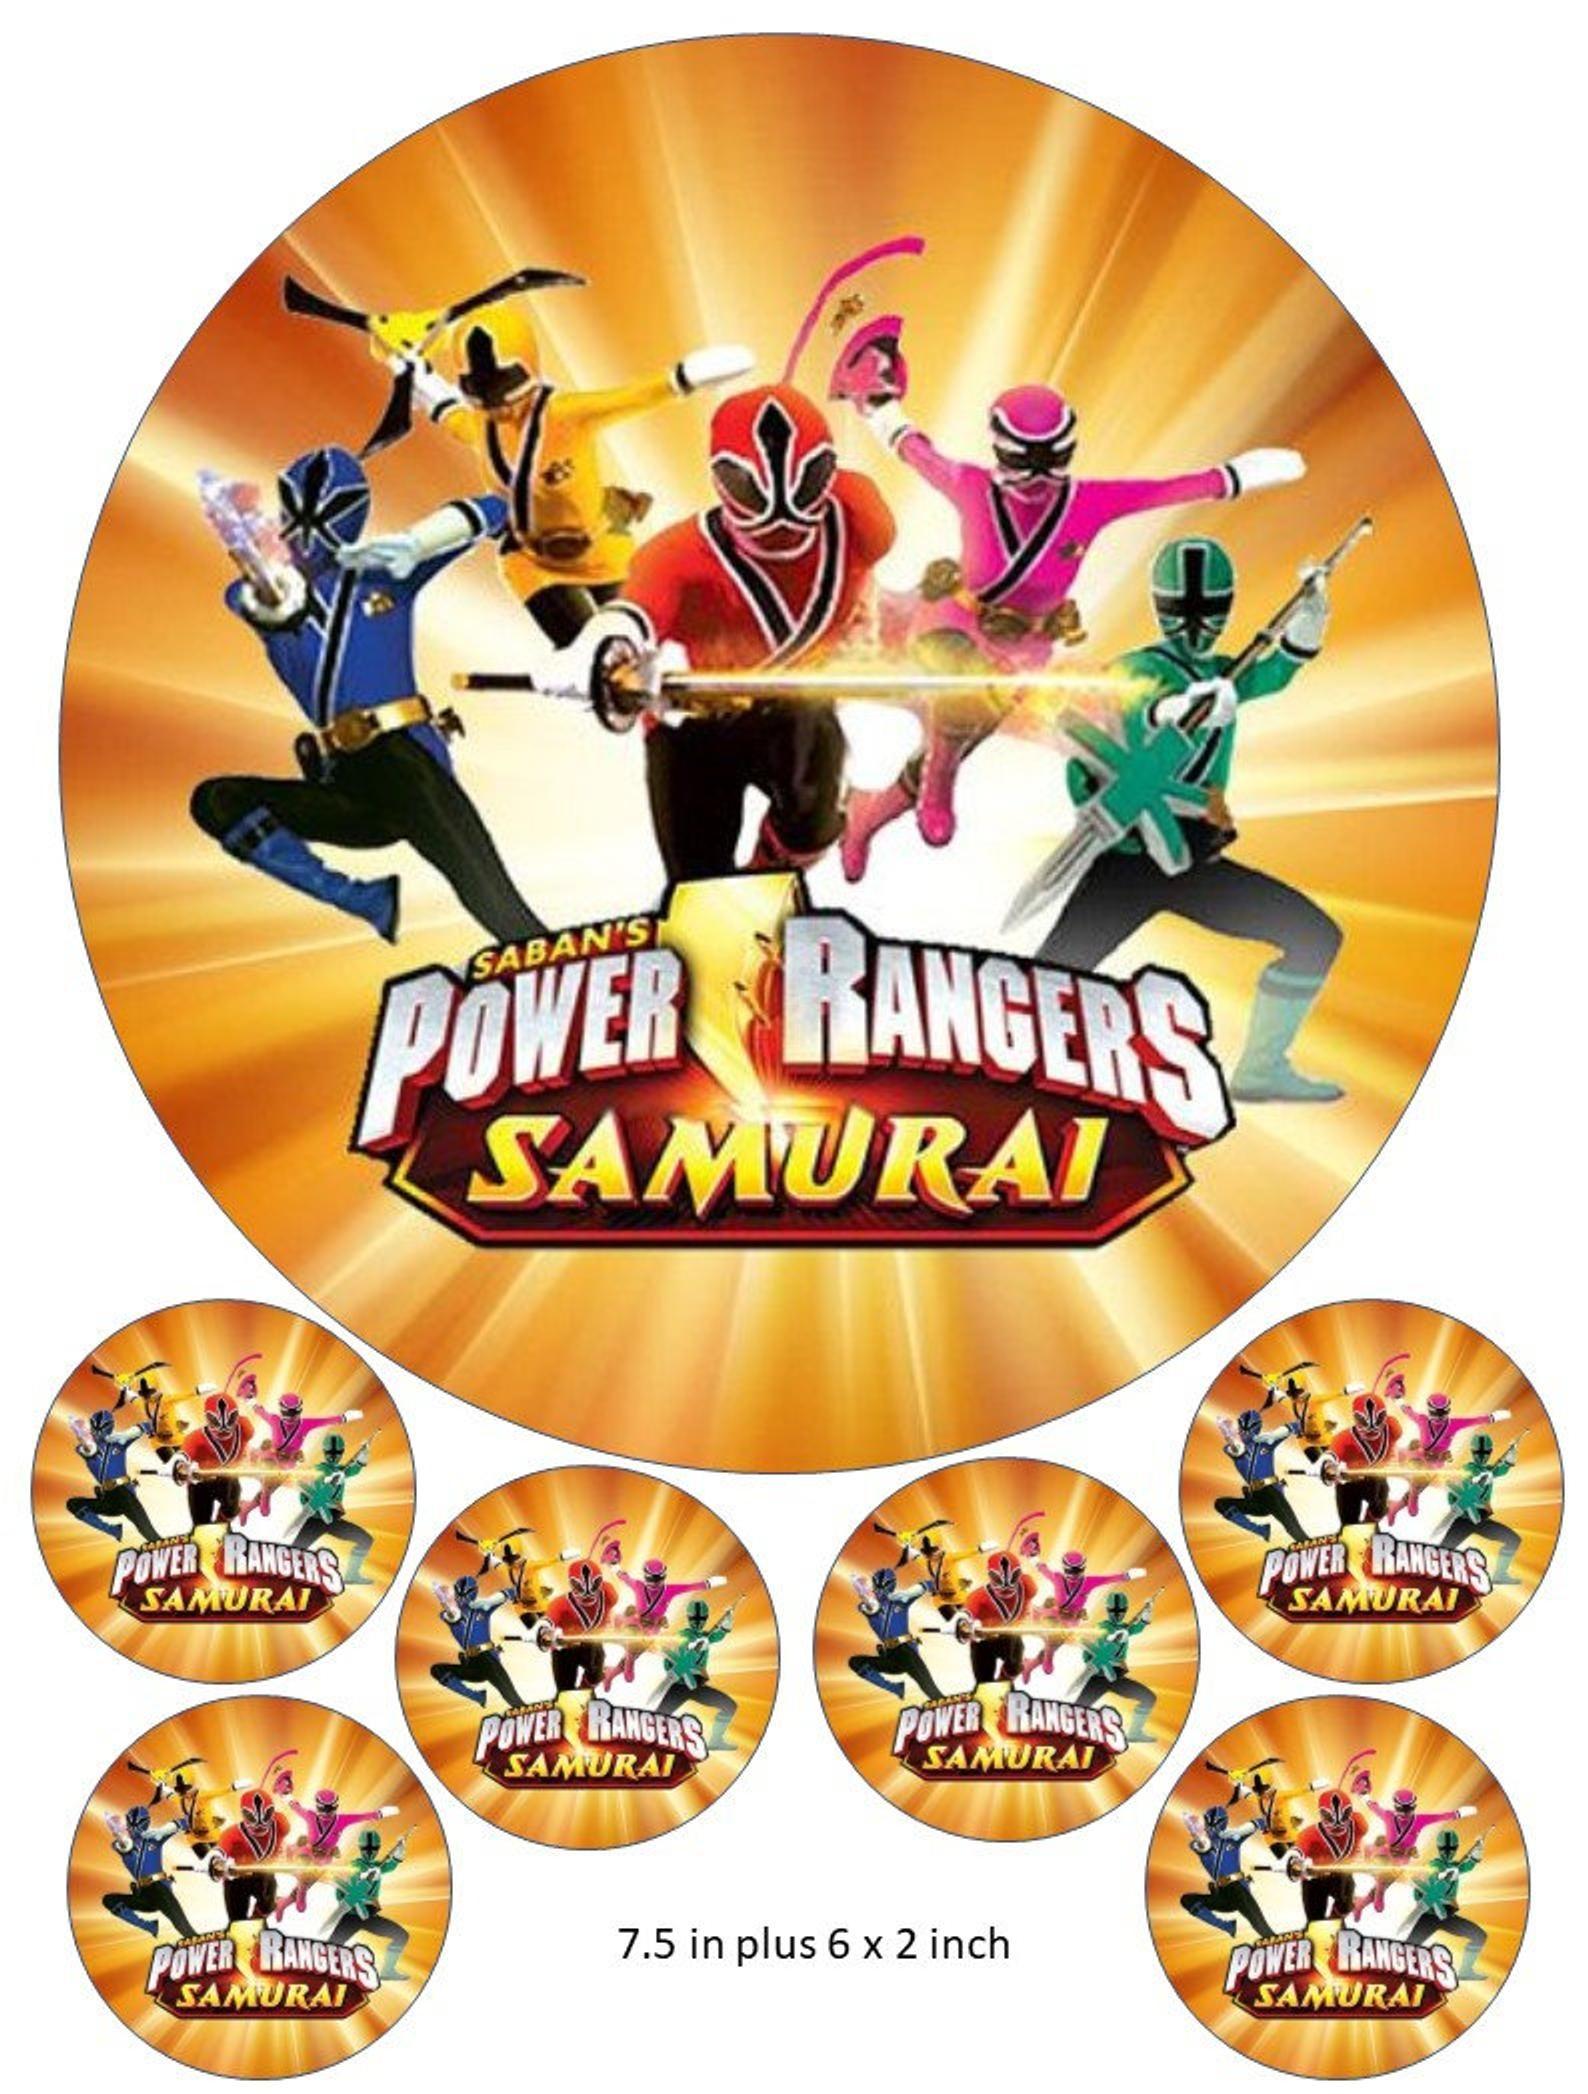 Power rangers cake and cupcake topper samurai ninja